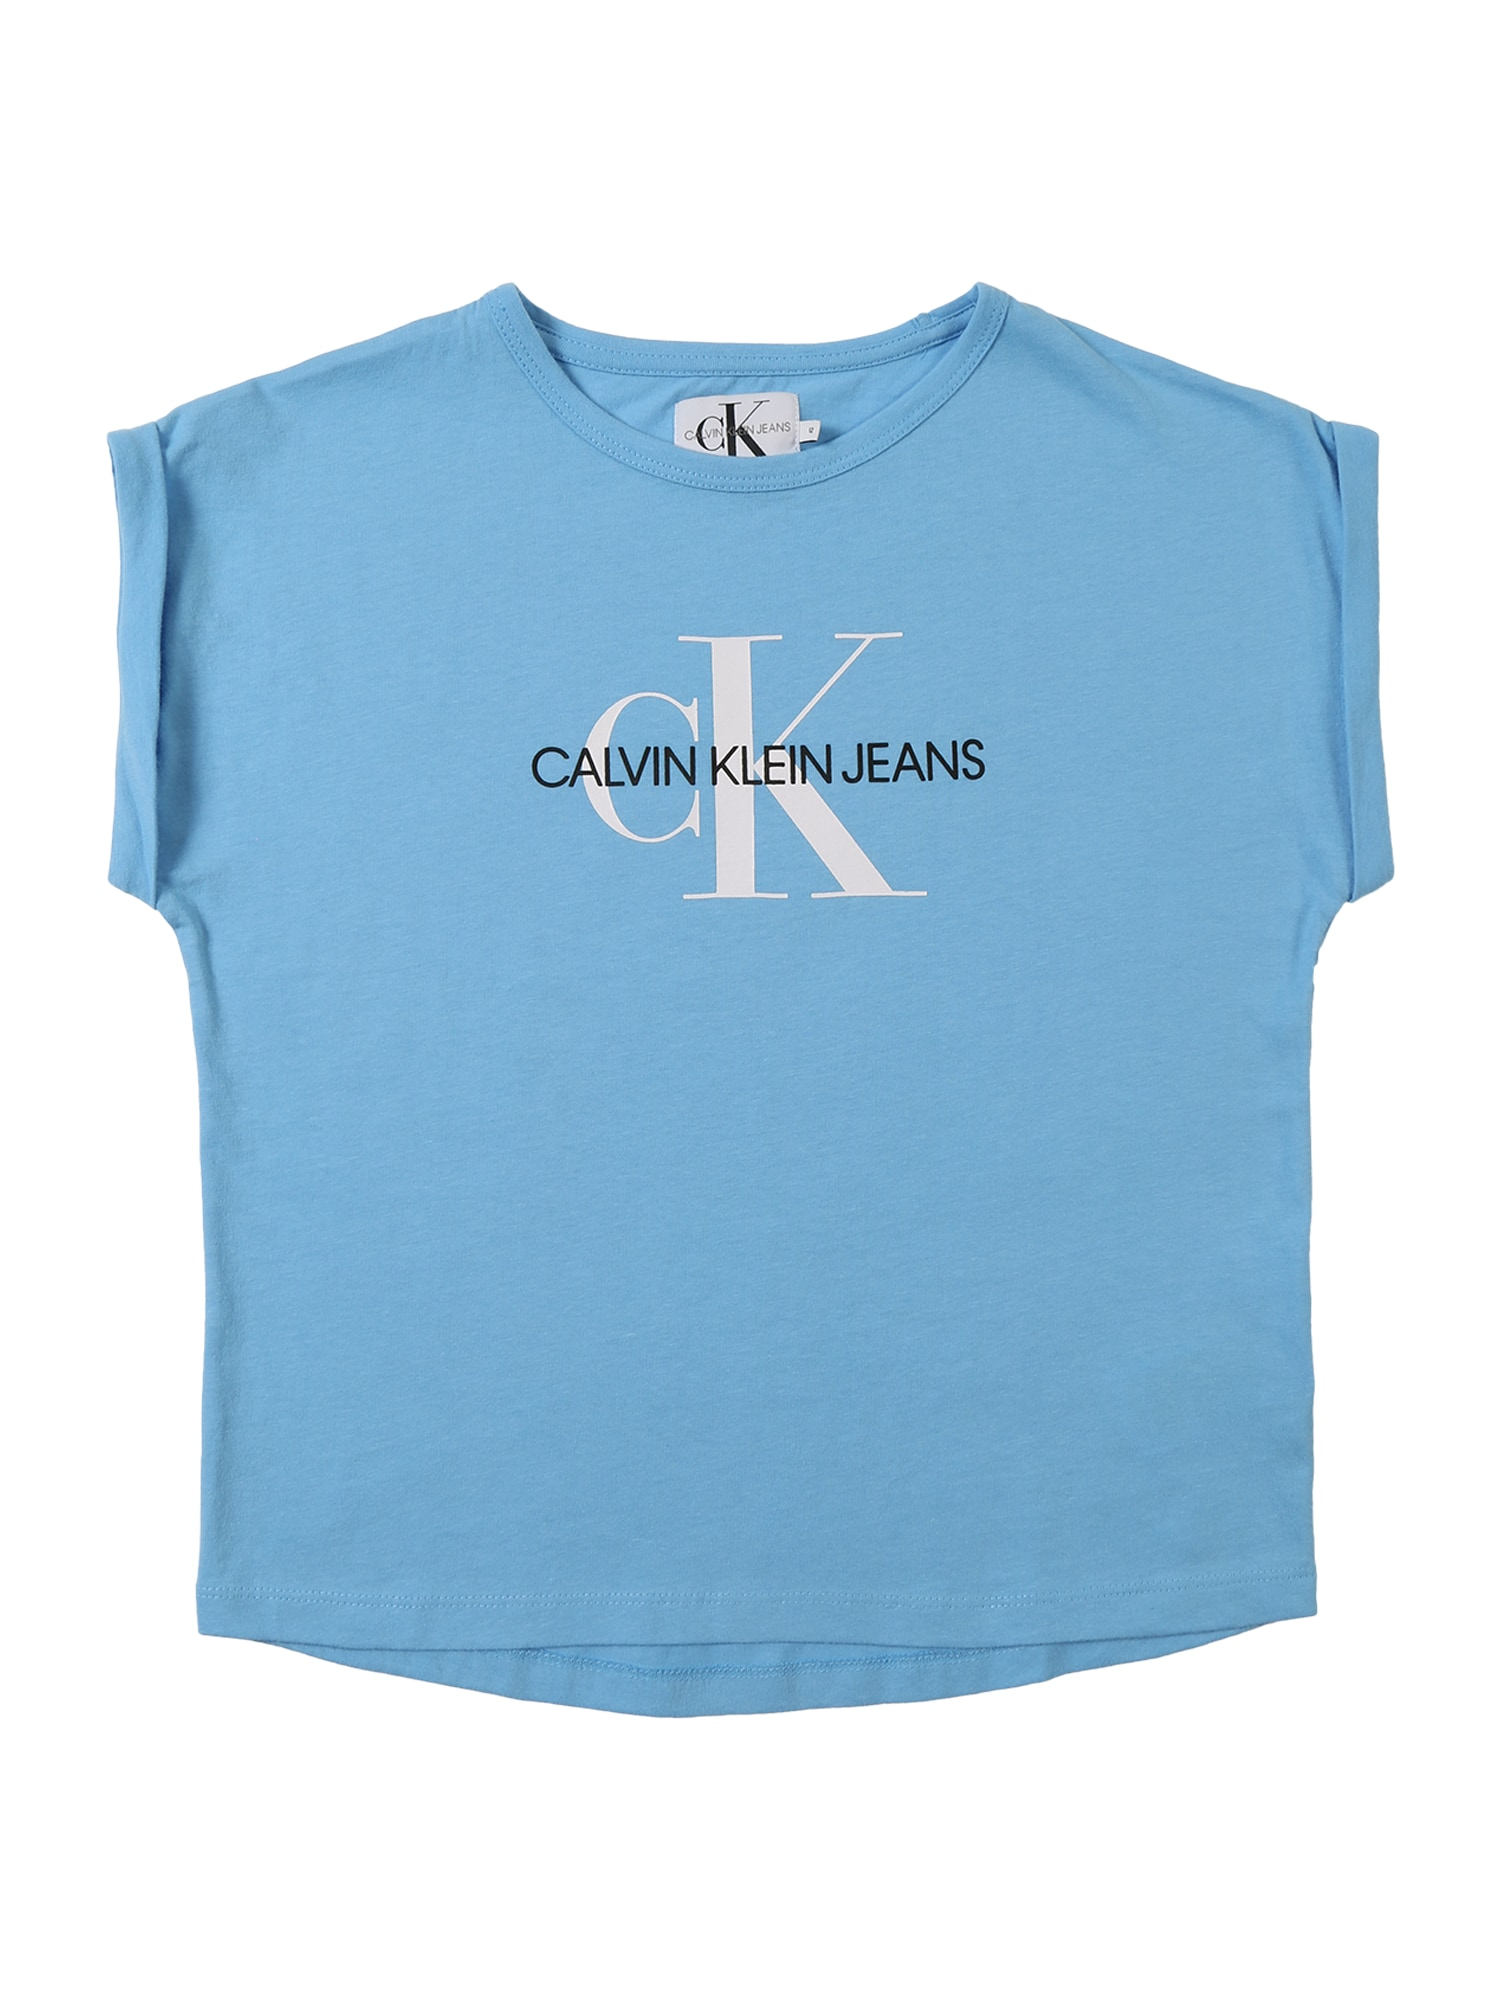 Top MONOGRAM LOOSE FIT TEE světlemodrá bílá Calvin Klein Jeans